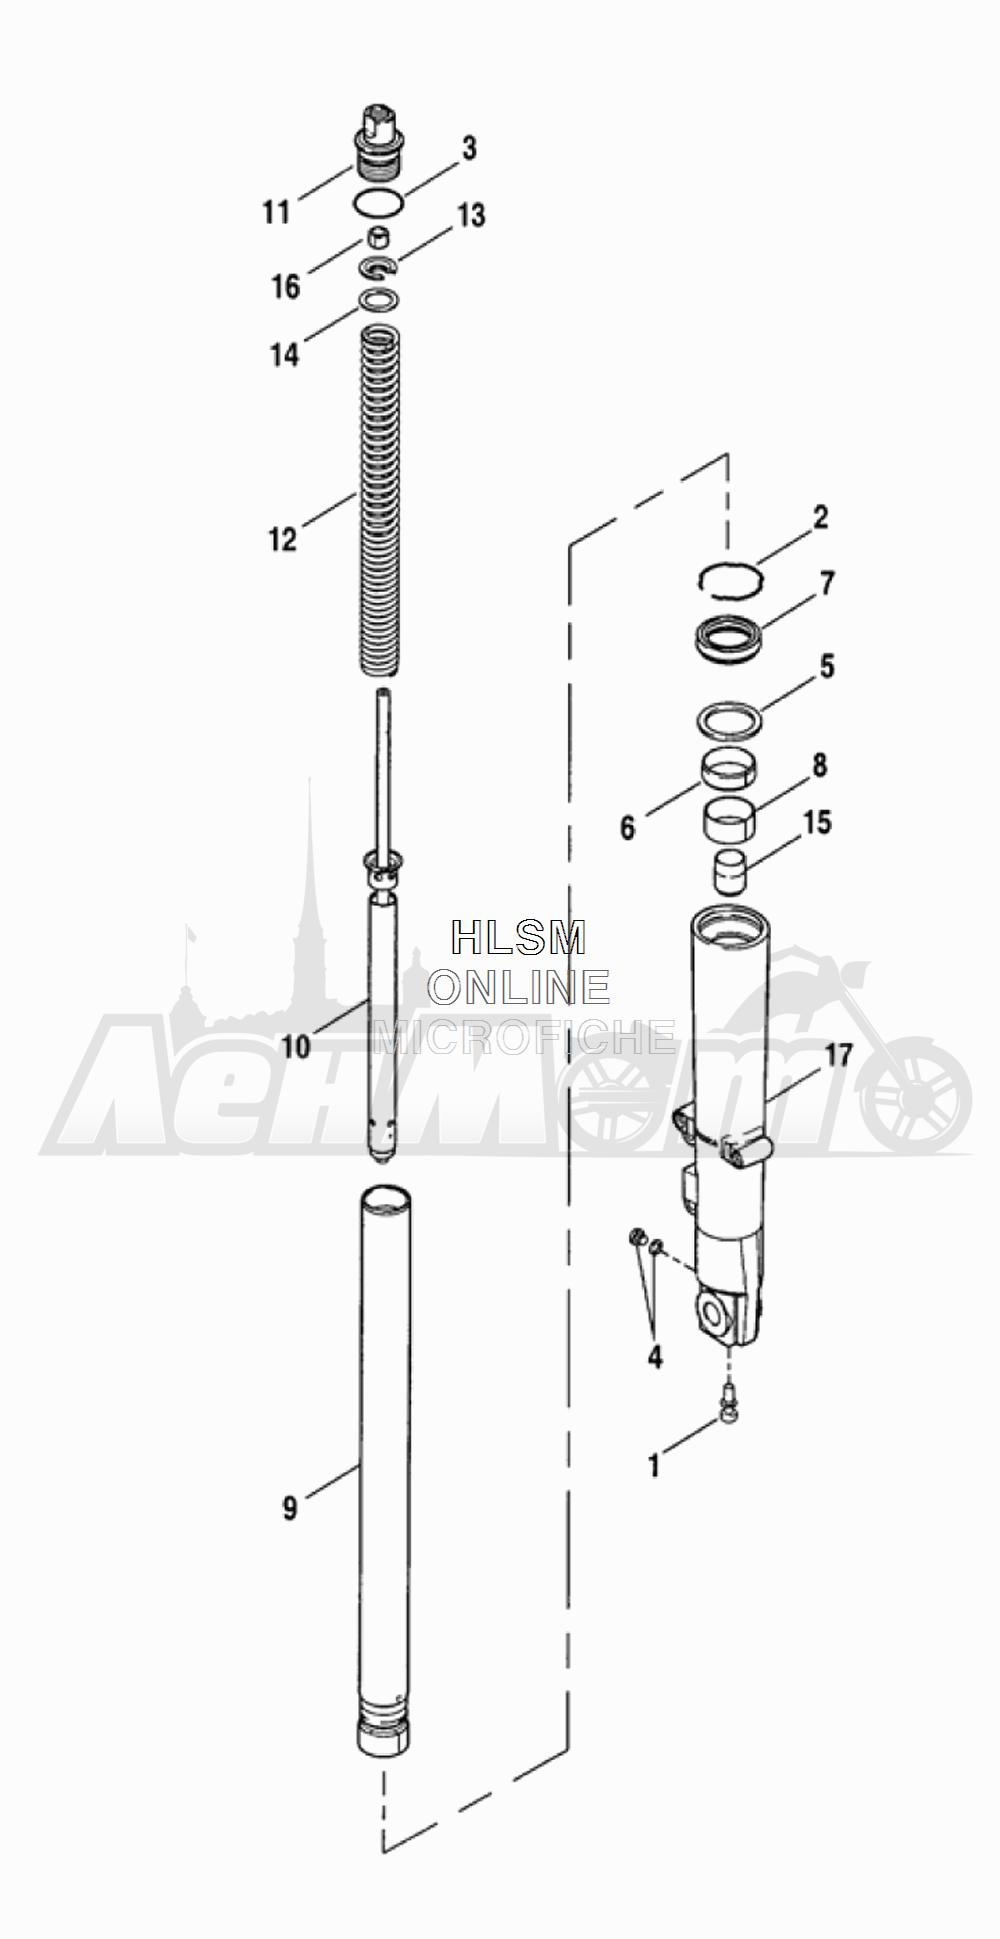 Запчасти для Мотоцикла Harley-Davidson 2005 FLTRI ROAD GLIDE® (INJECTION) (FS) Раздел: SUSPENSION - FRONT FORK - LEFT (FAIRING MODELS) | передняя подвеска вилка левая сторона (модели с обтекателем)